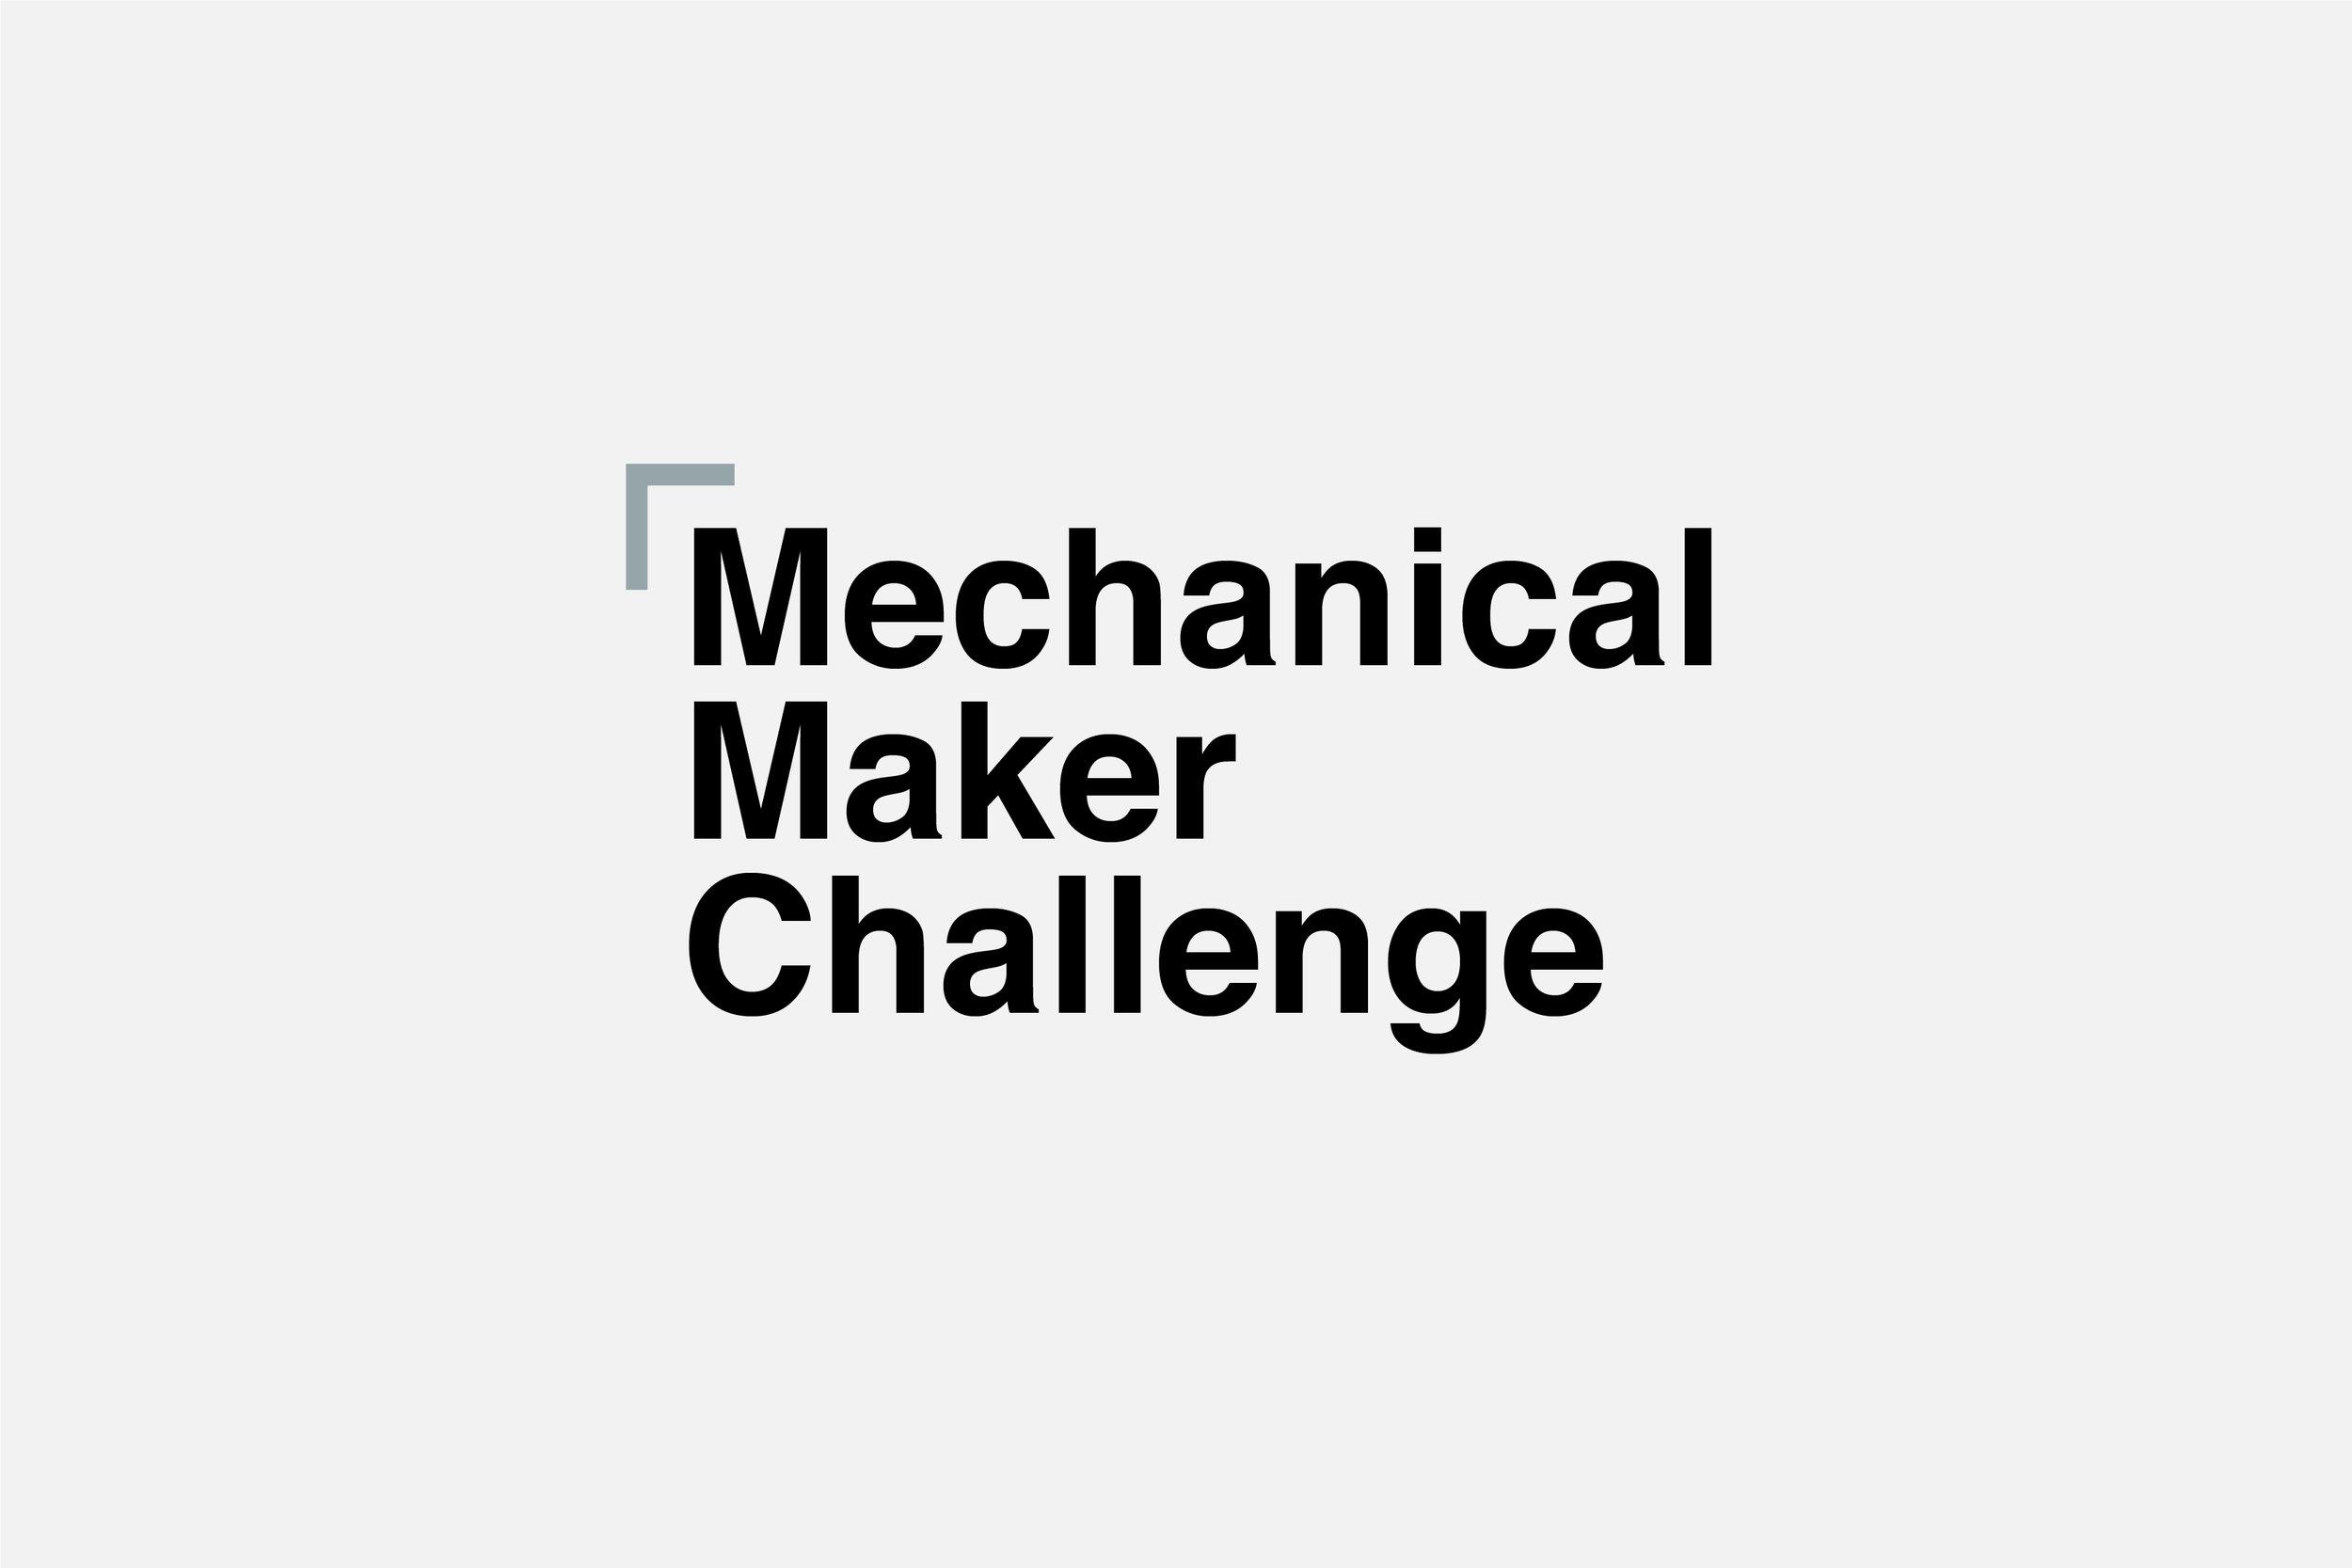 Mechanical-Maker-Grey-04.jpg